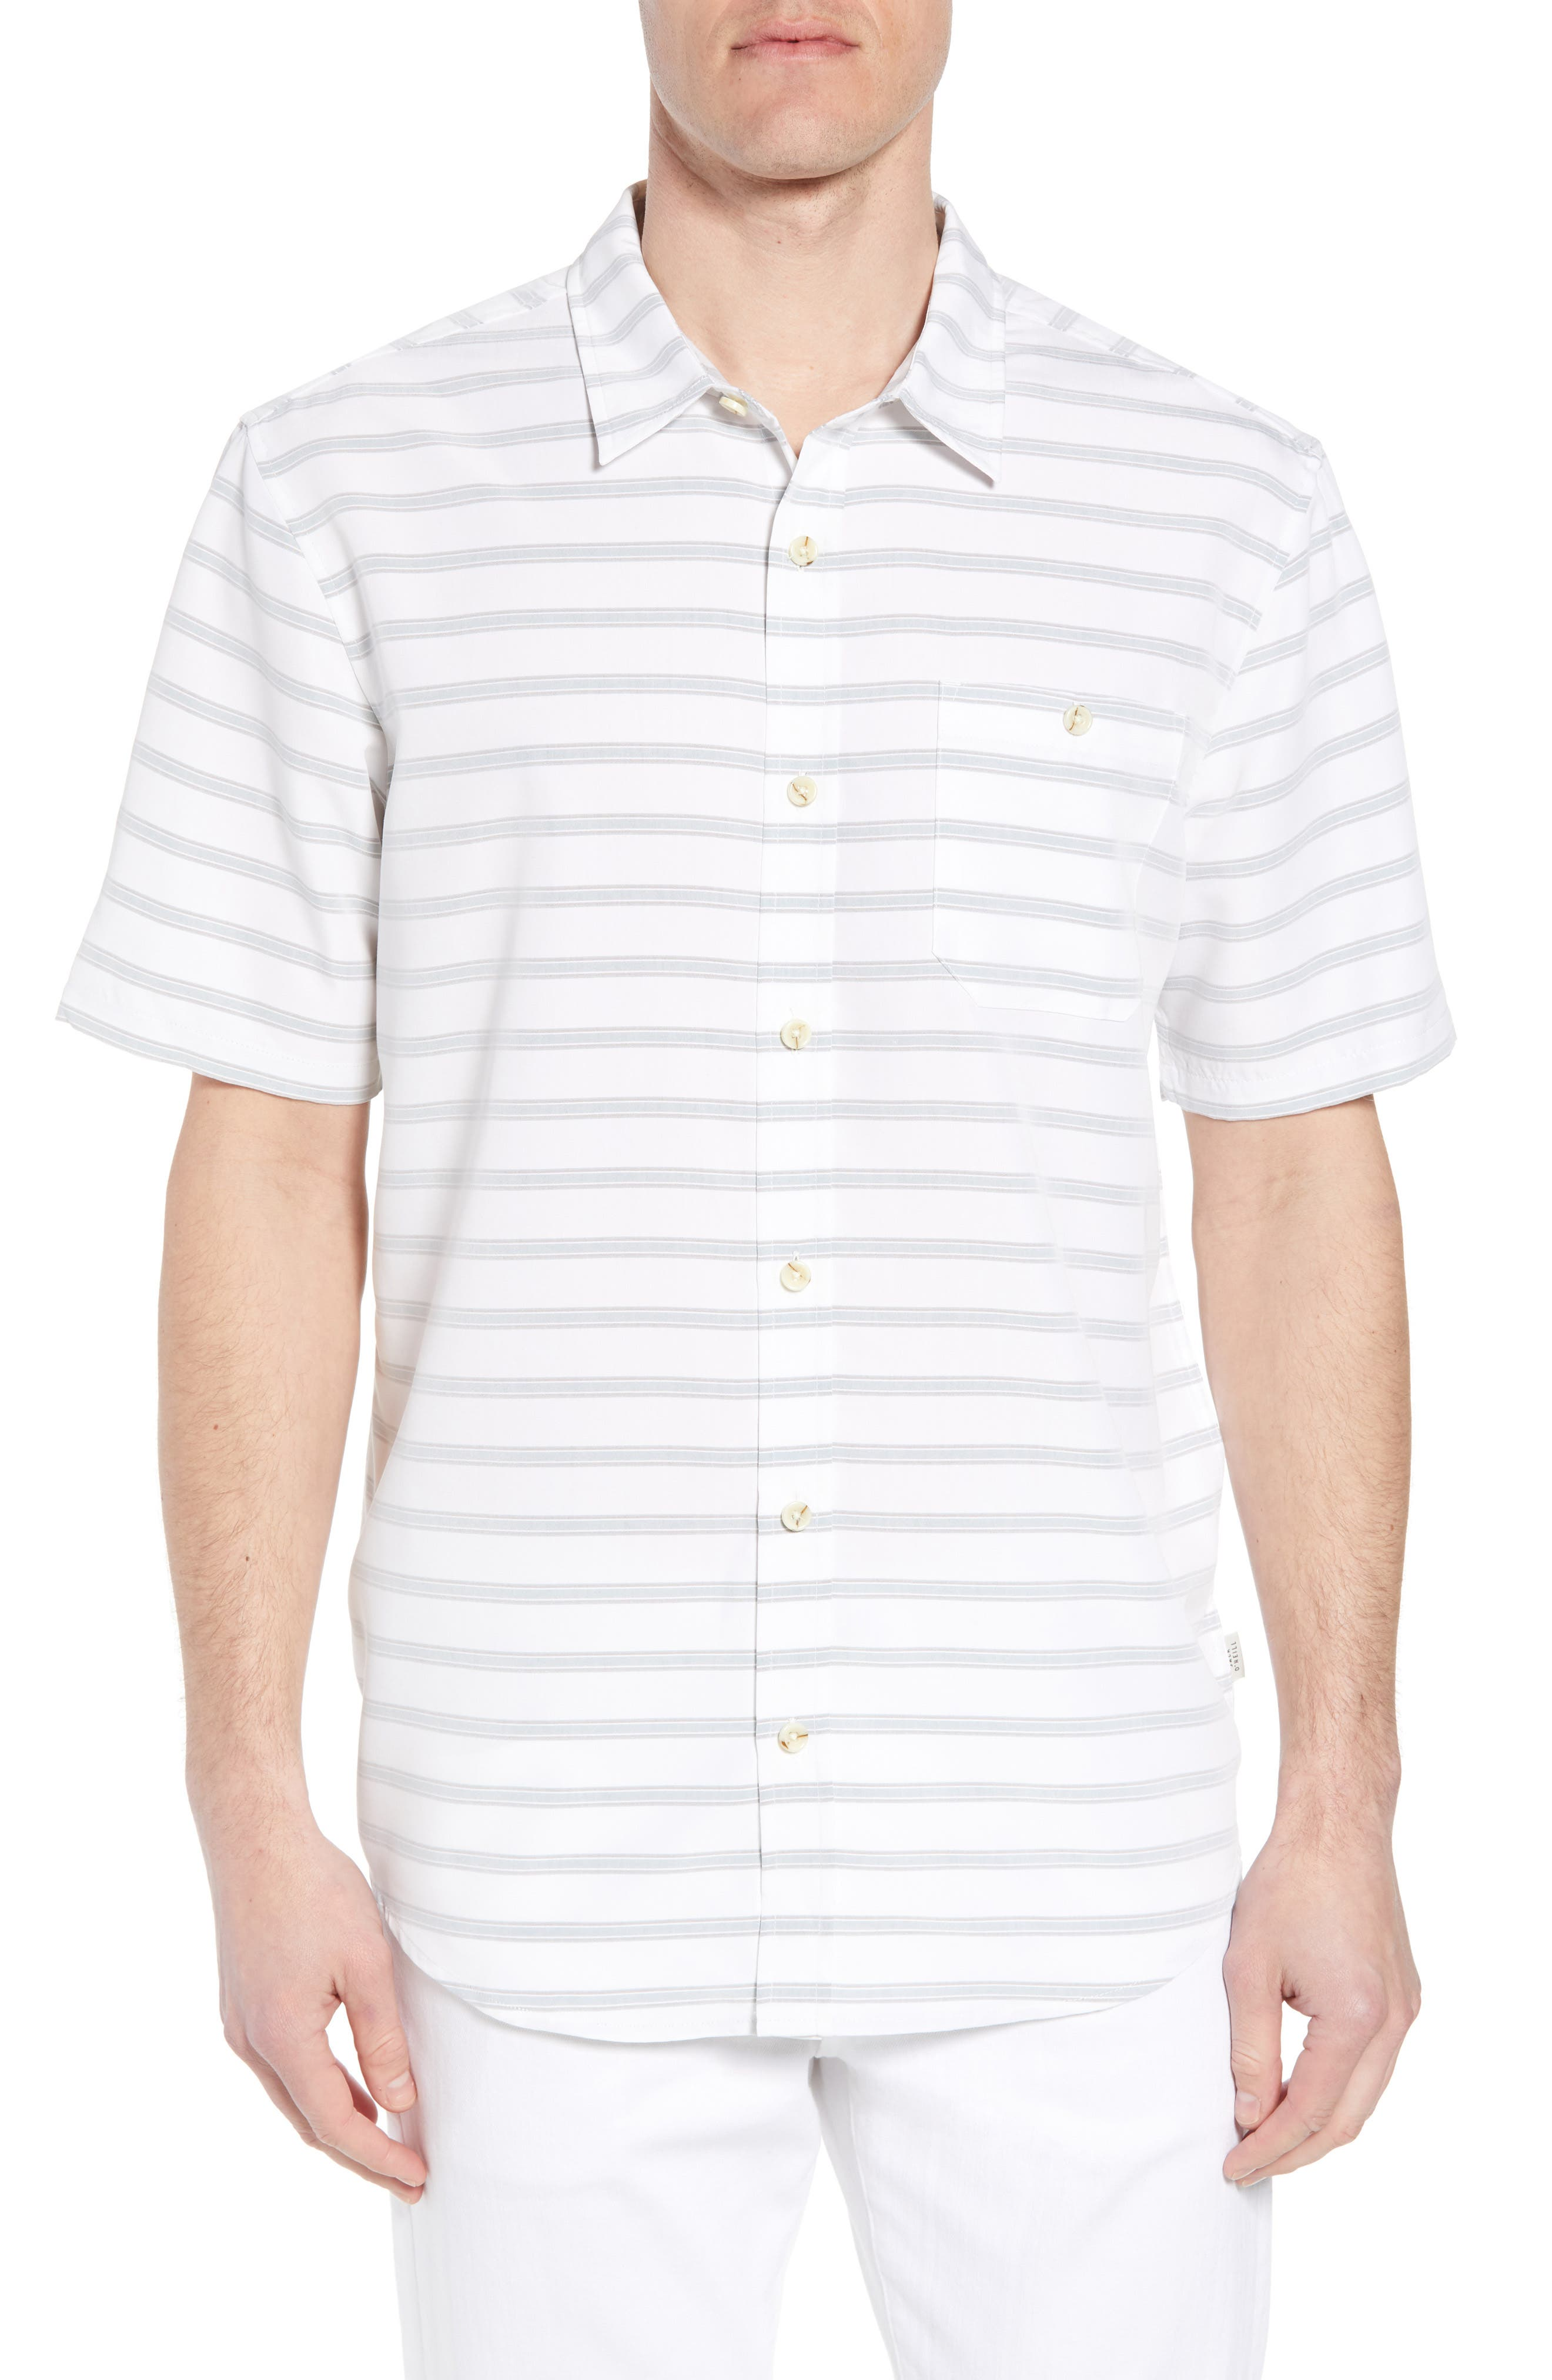 Slow Ride Sport Shirt,                         Main,                         color, White